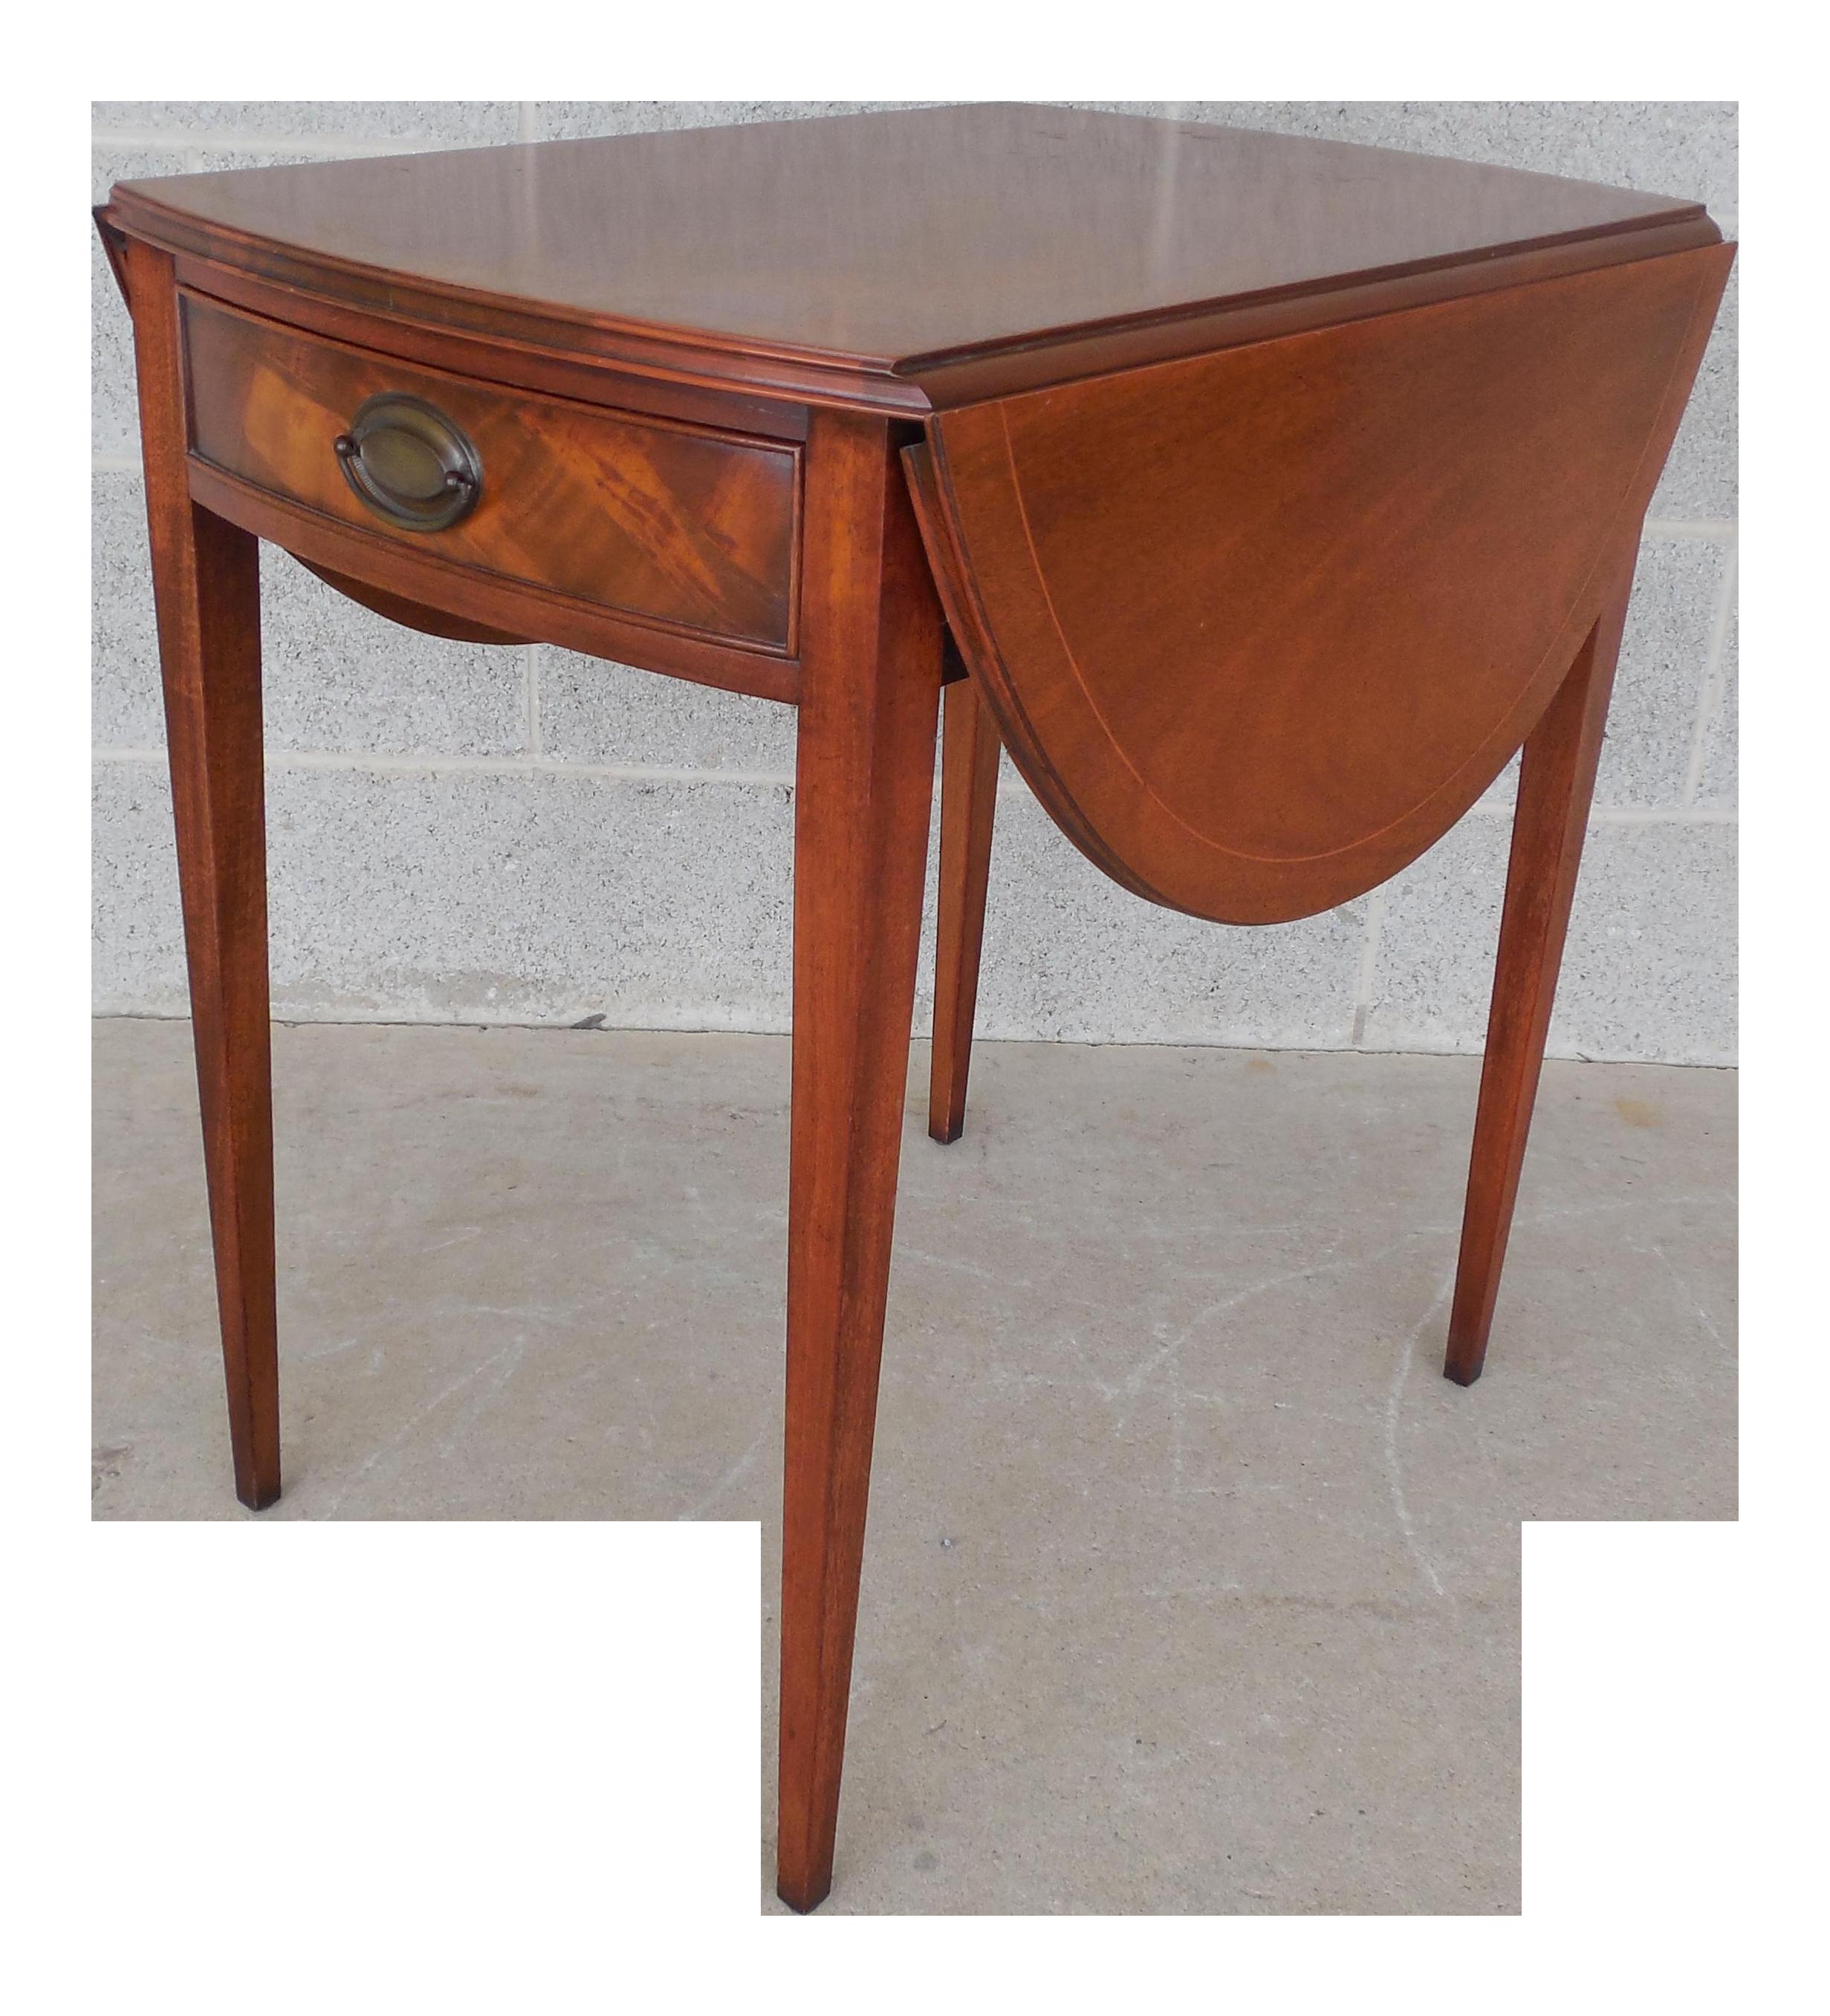 Henredon Vintage Federal Style Pembroke End Table Chairish : henredon vintage federal style pembroke end table 7393 from www.chairish.com size 2463 x 2714 png 4328kB